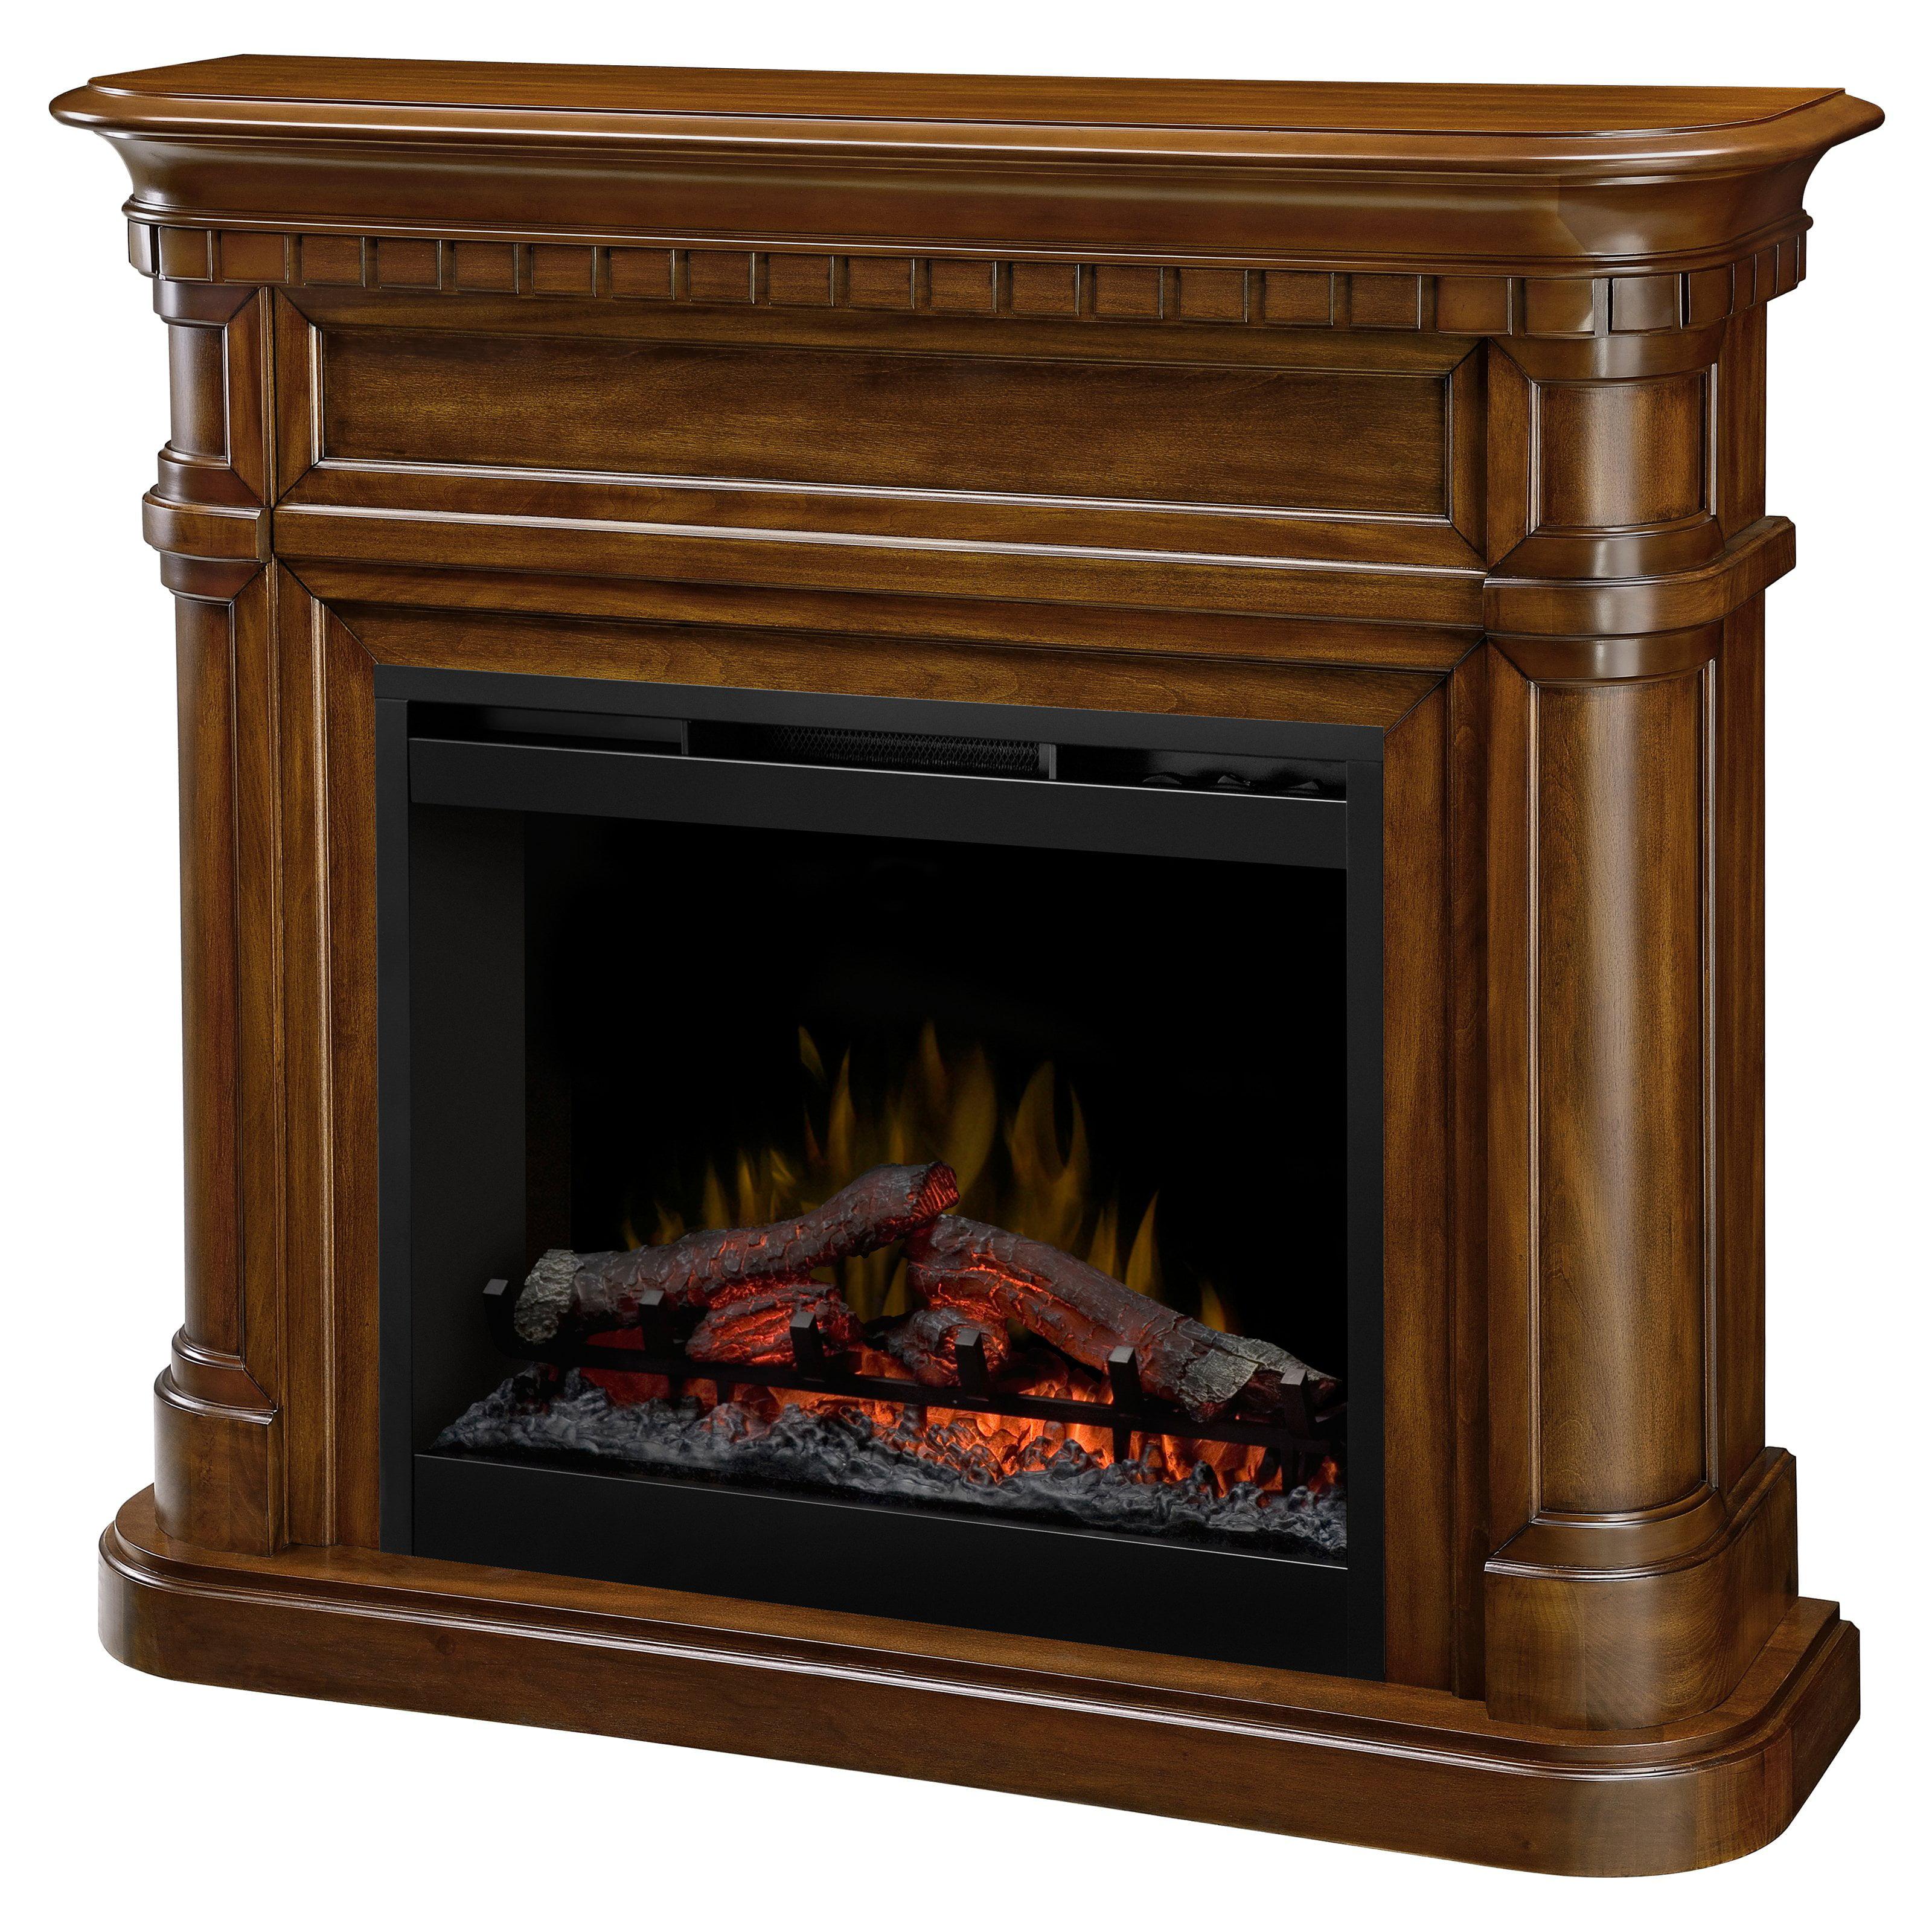 Dimplex Charleston Electric Fireplace - Walmart.com